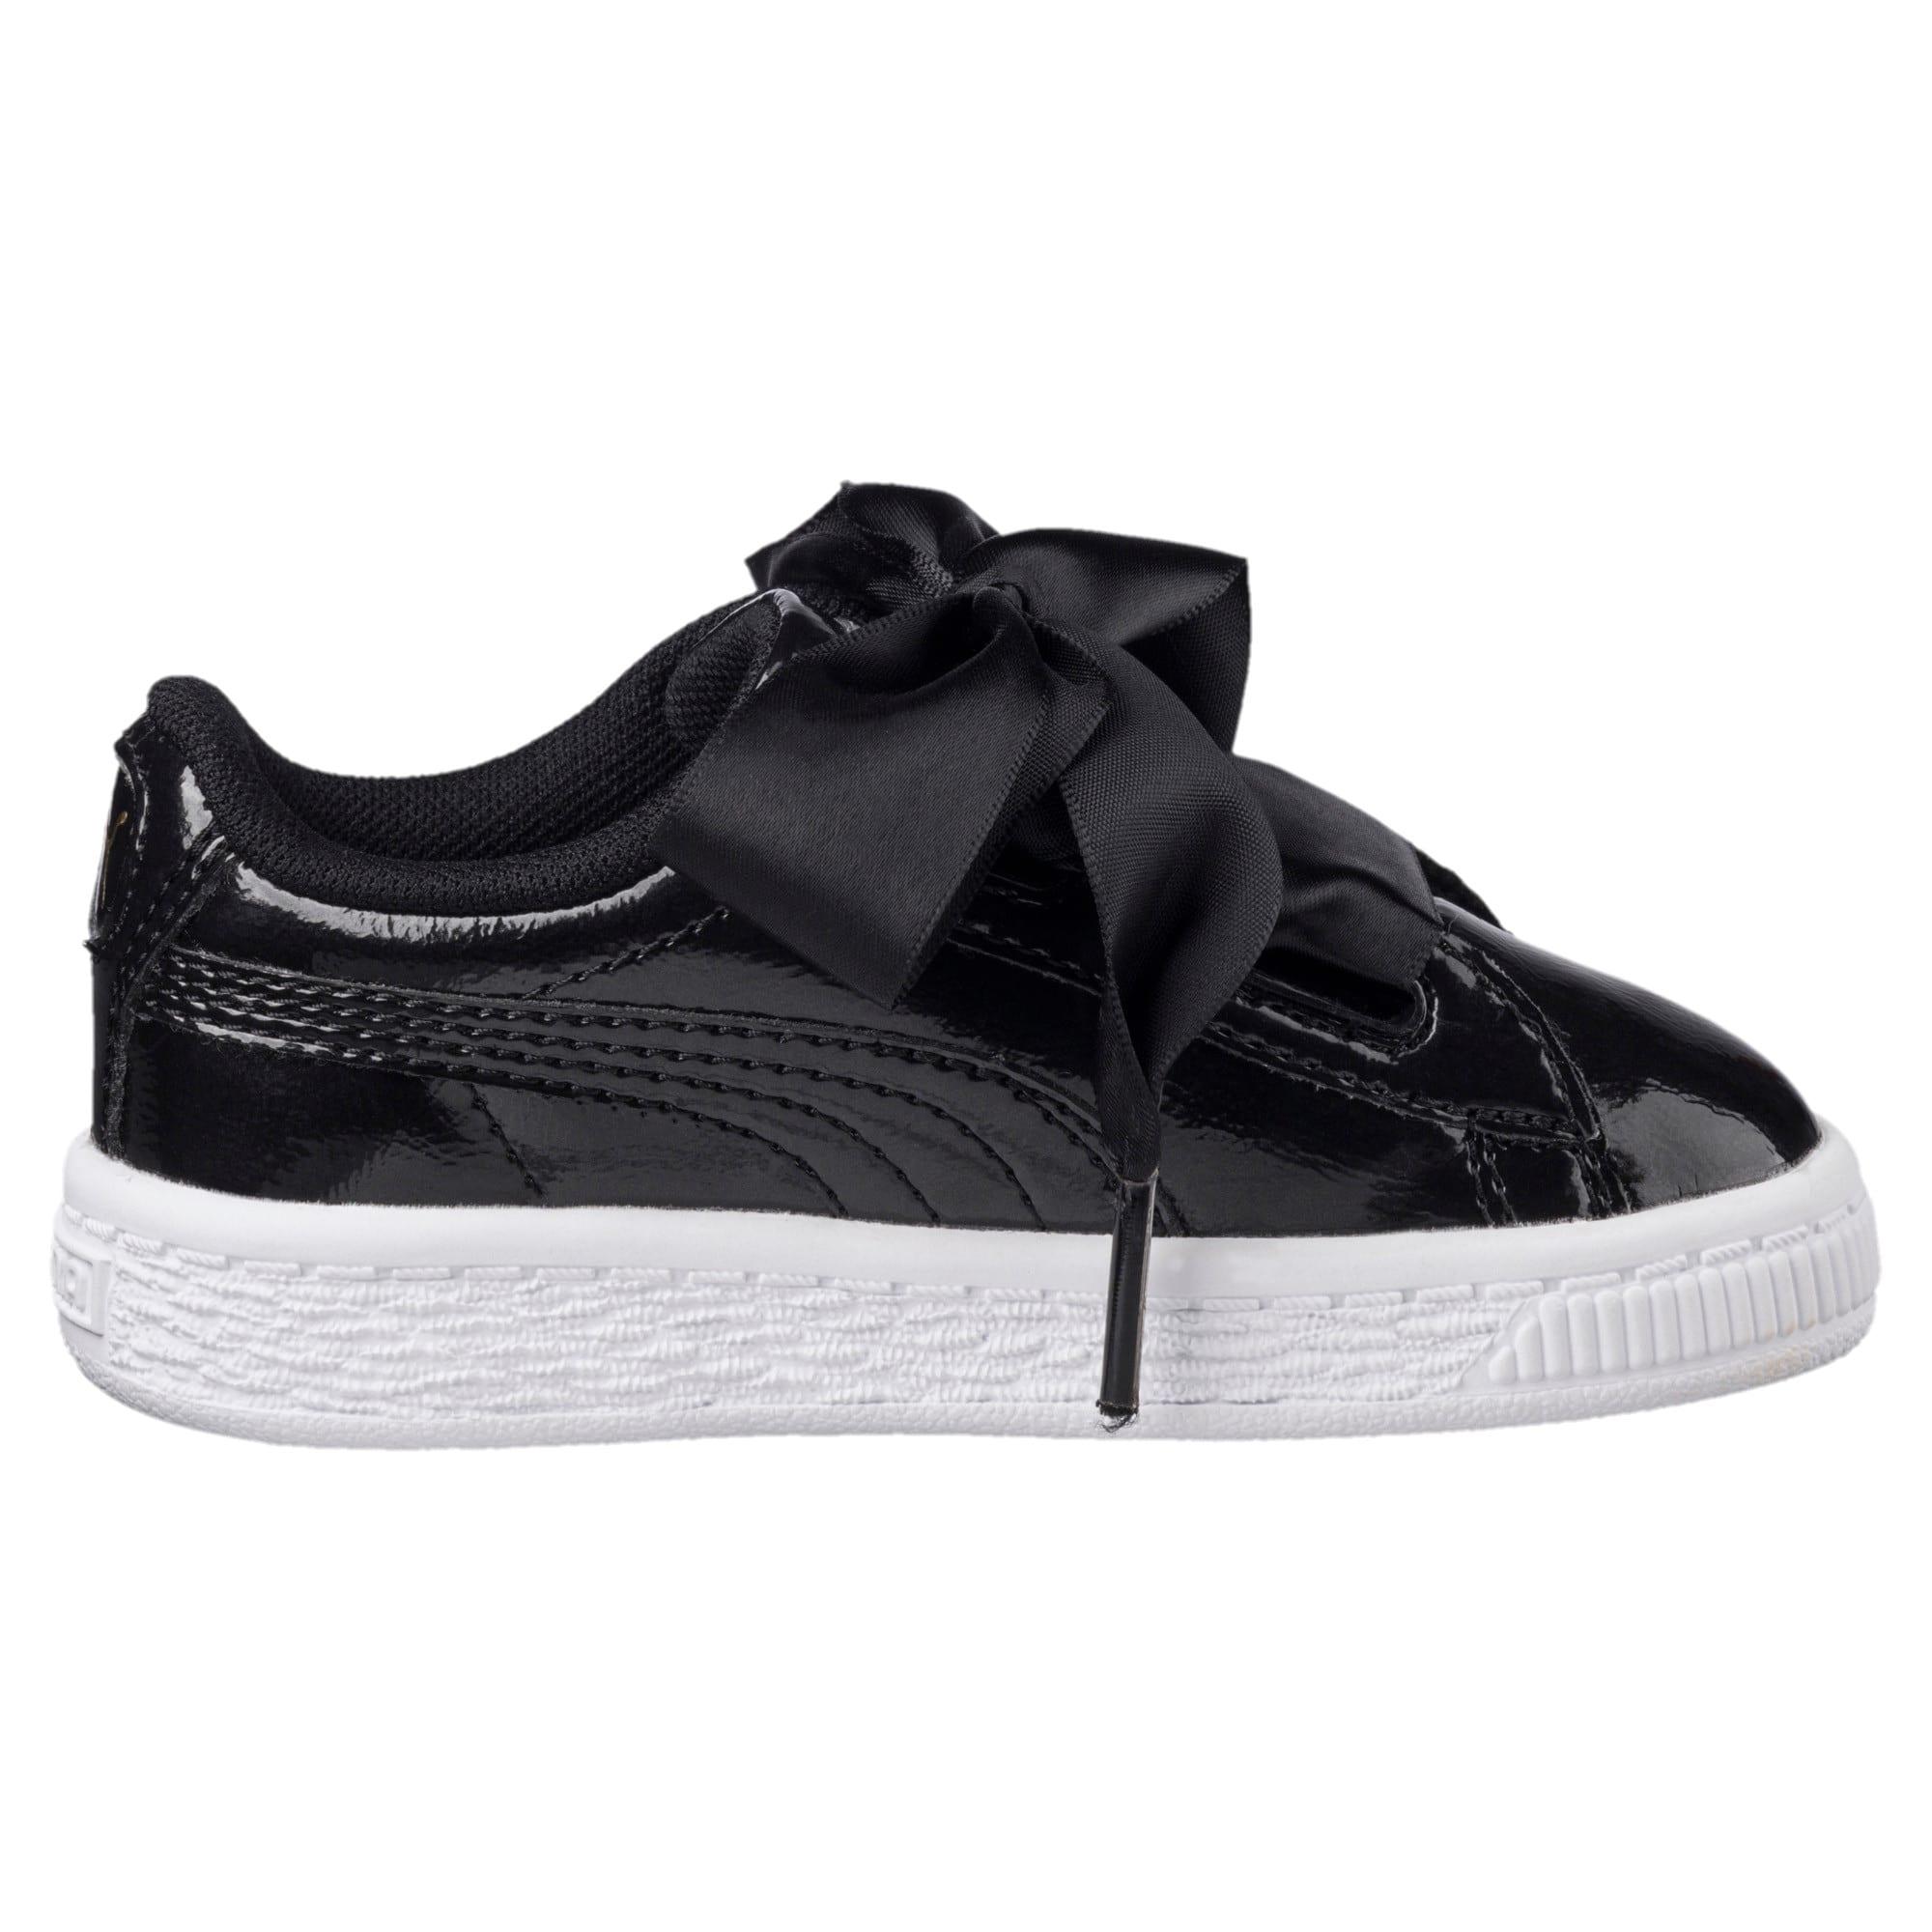 Thumbnail 3 of Basket Heart Glam Little Kids' Shoes, Puma Black-Puma Black, medium